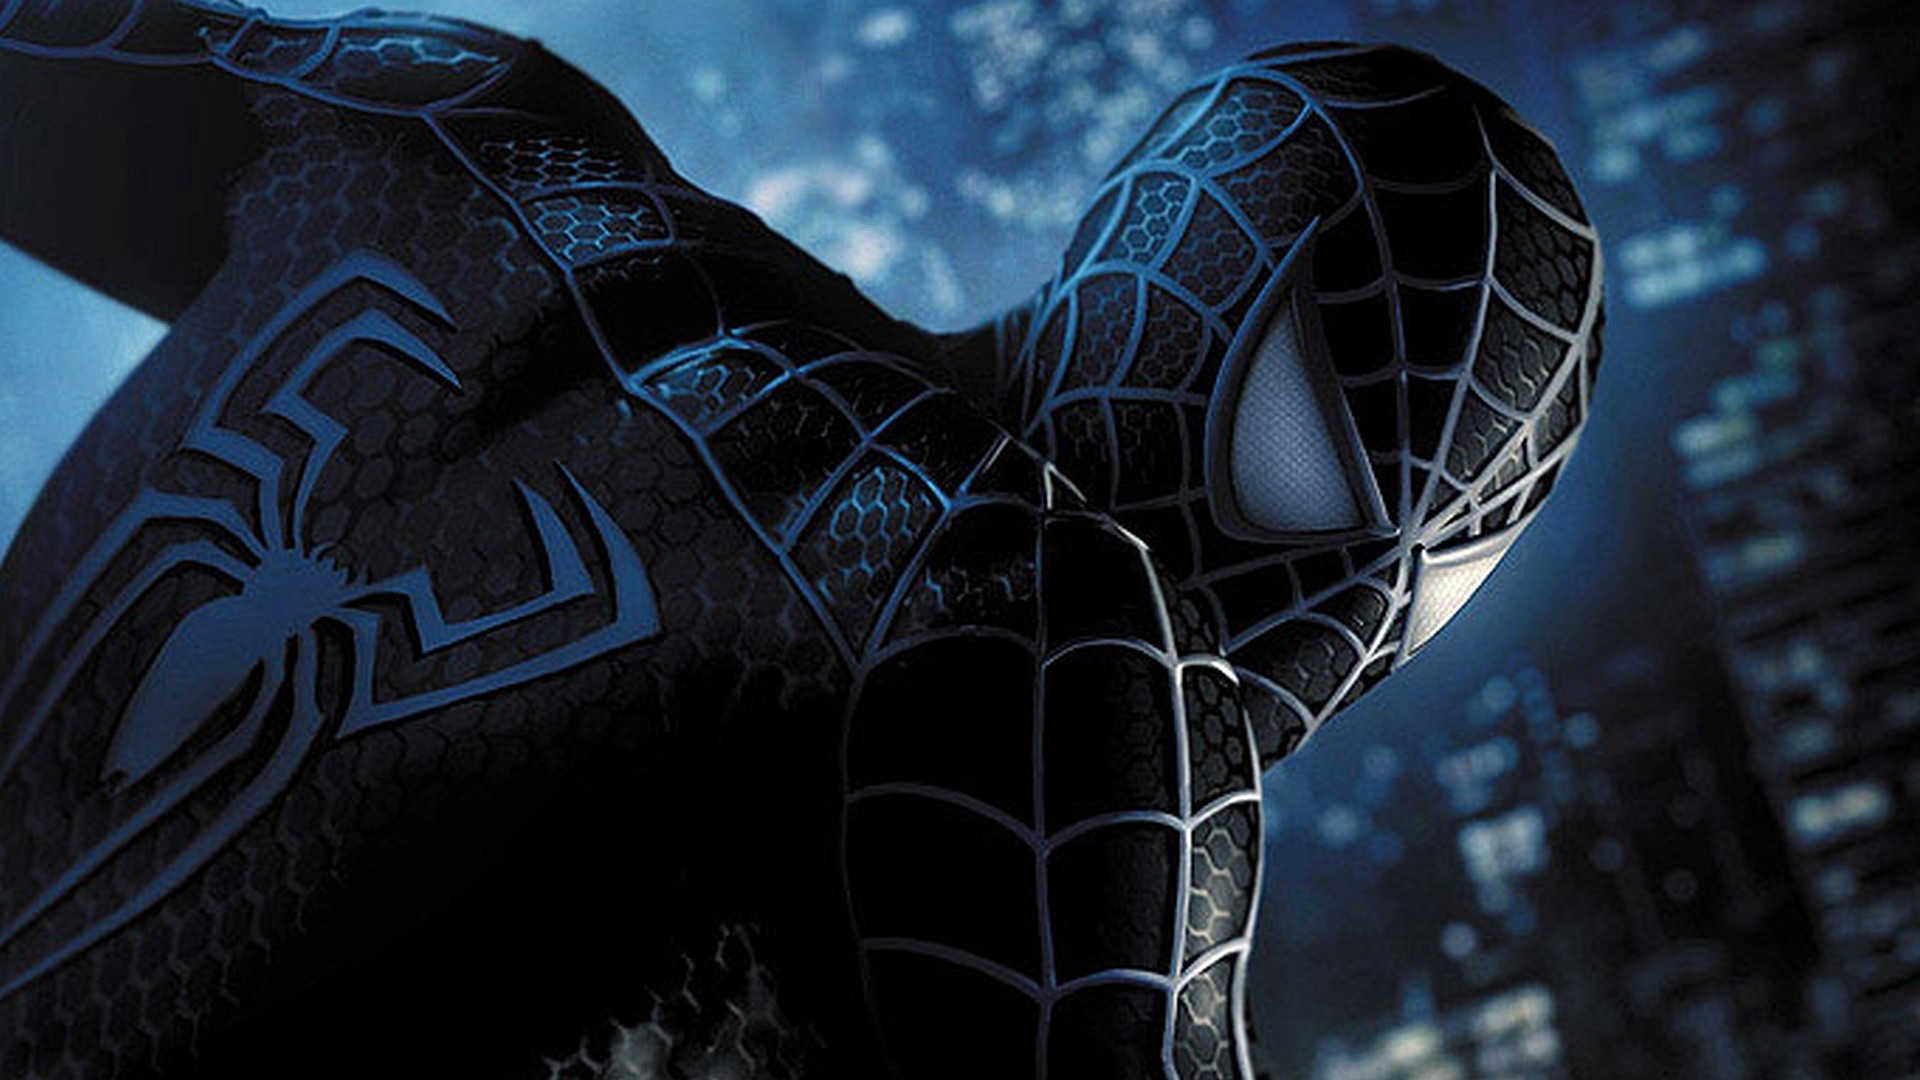 Free spiderman and venom wallpaper background